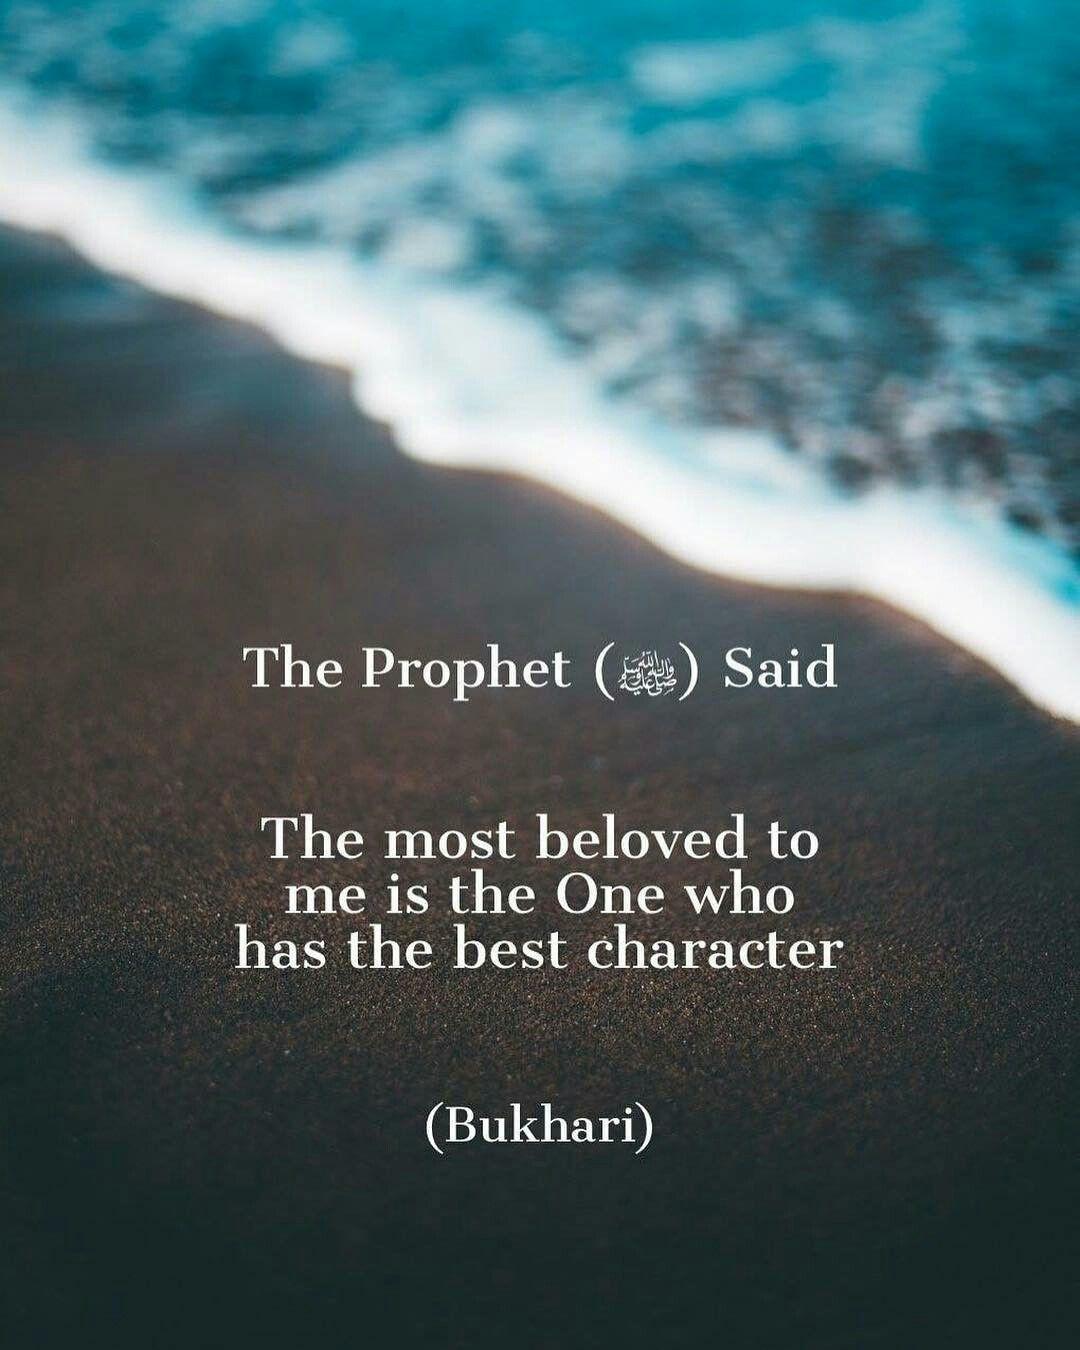 Pin by Asma Mujeer ∞ on Islam | Islamic quotes, Hadith